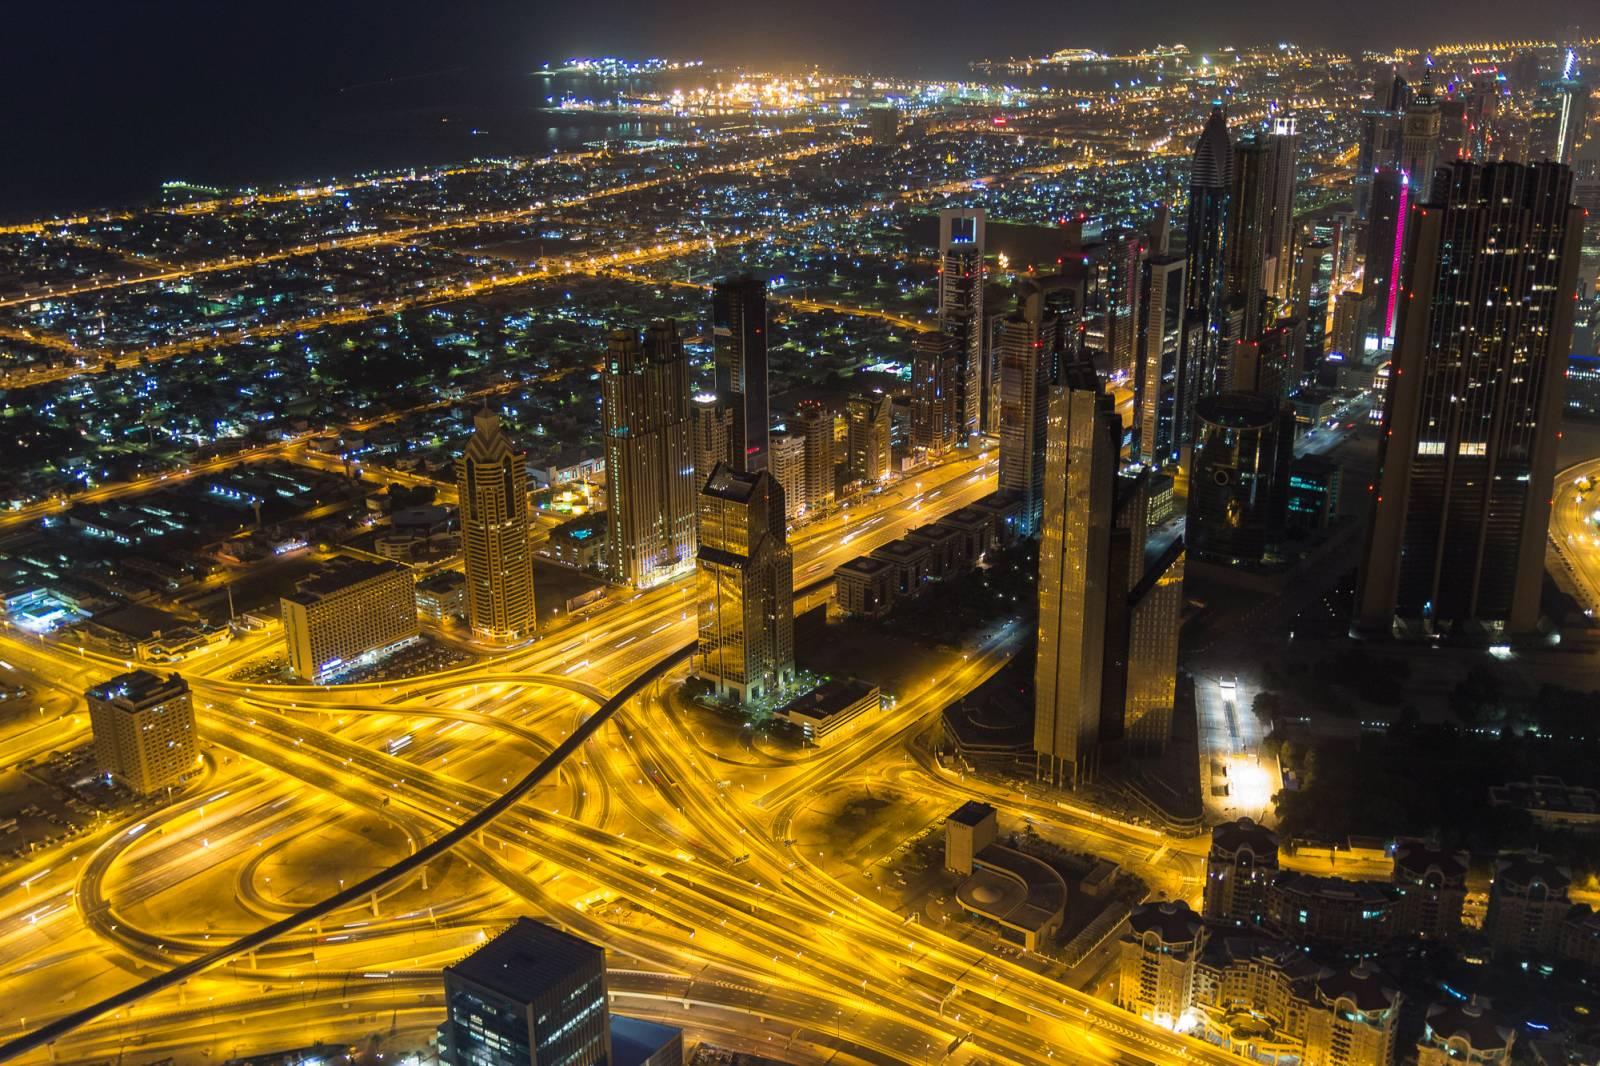 At the Top (Burj Khalifa)